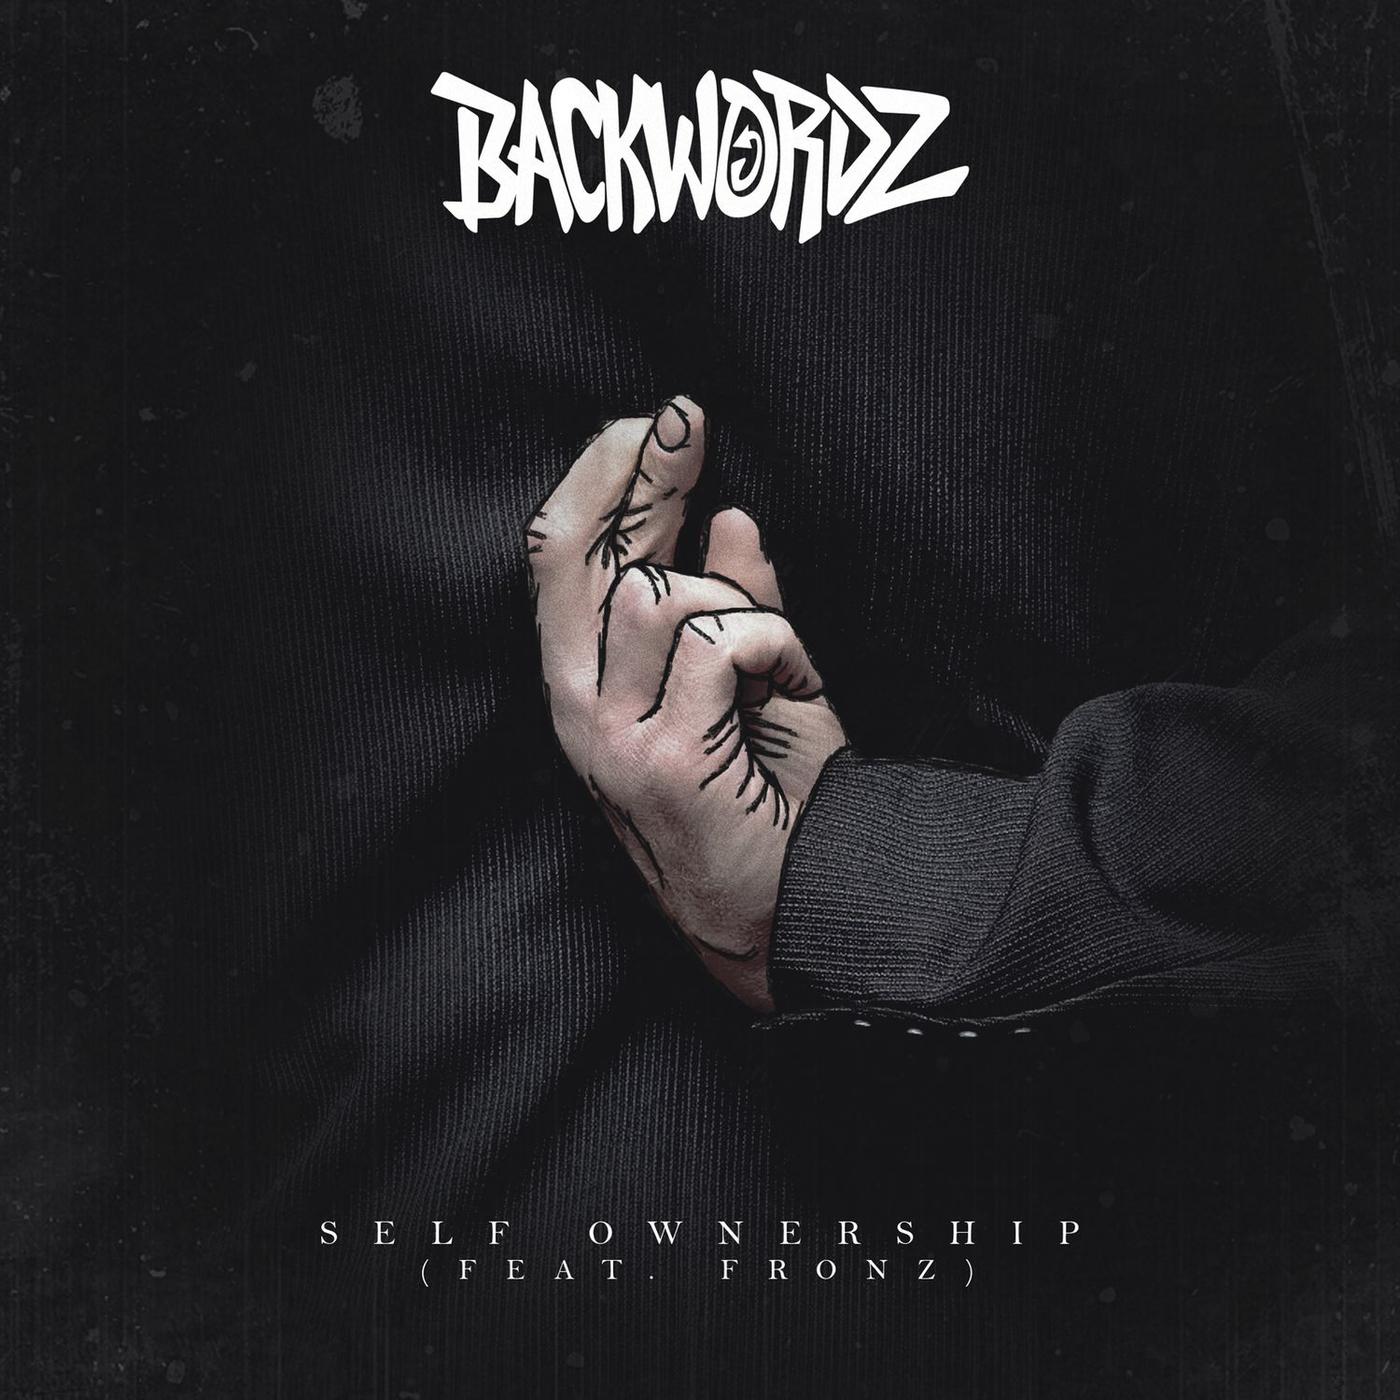 BackWordz - Self Ownership [single] (2017)